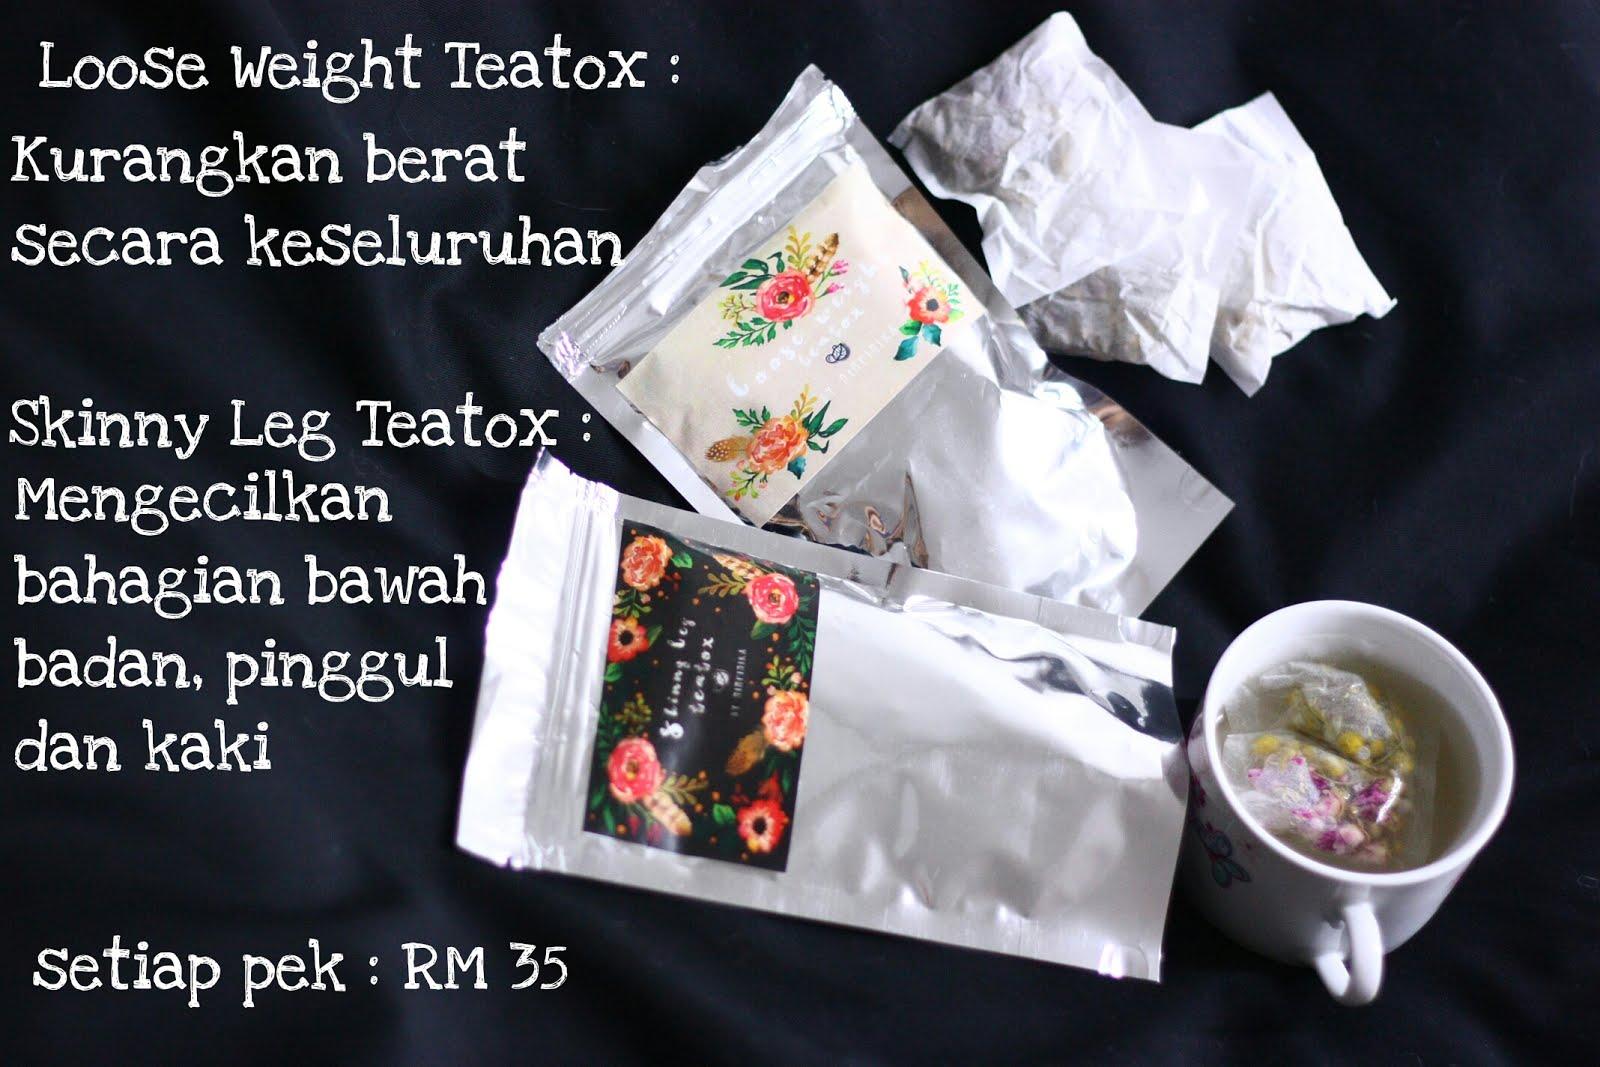 Iday Jual Teatox